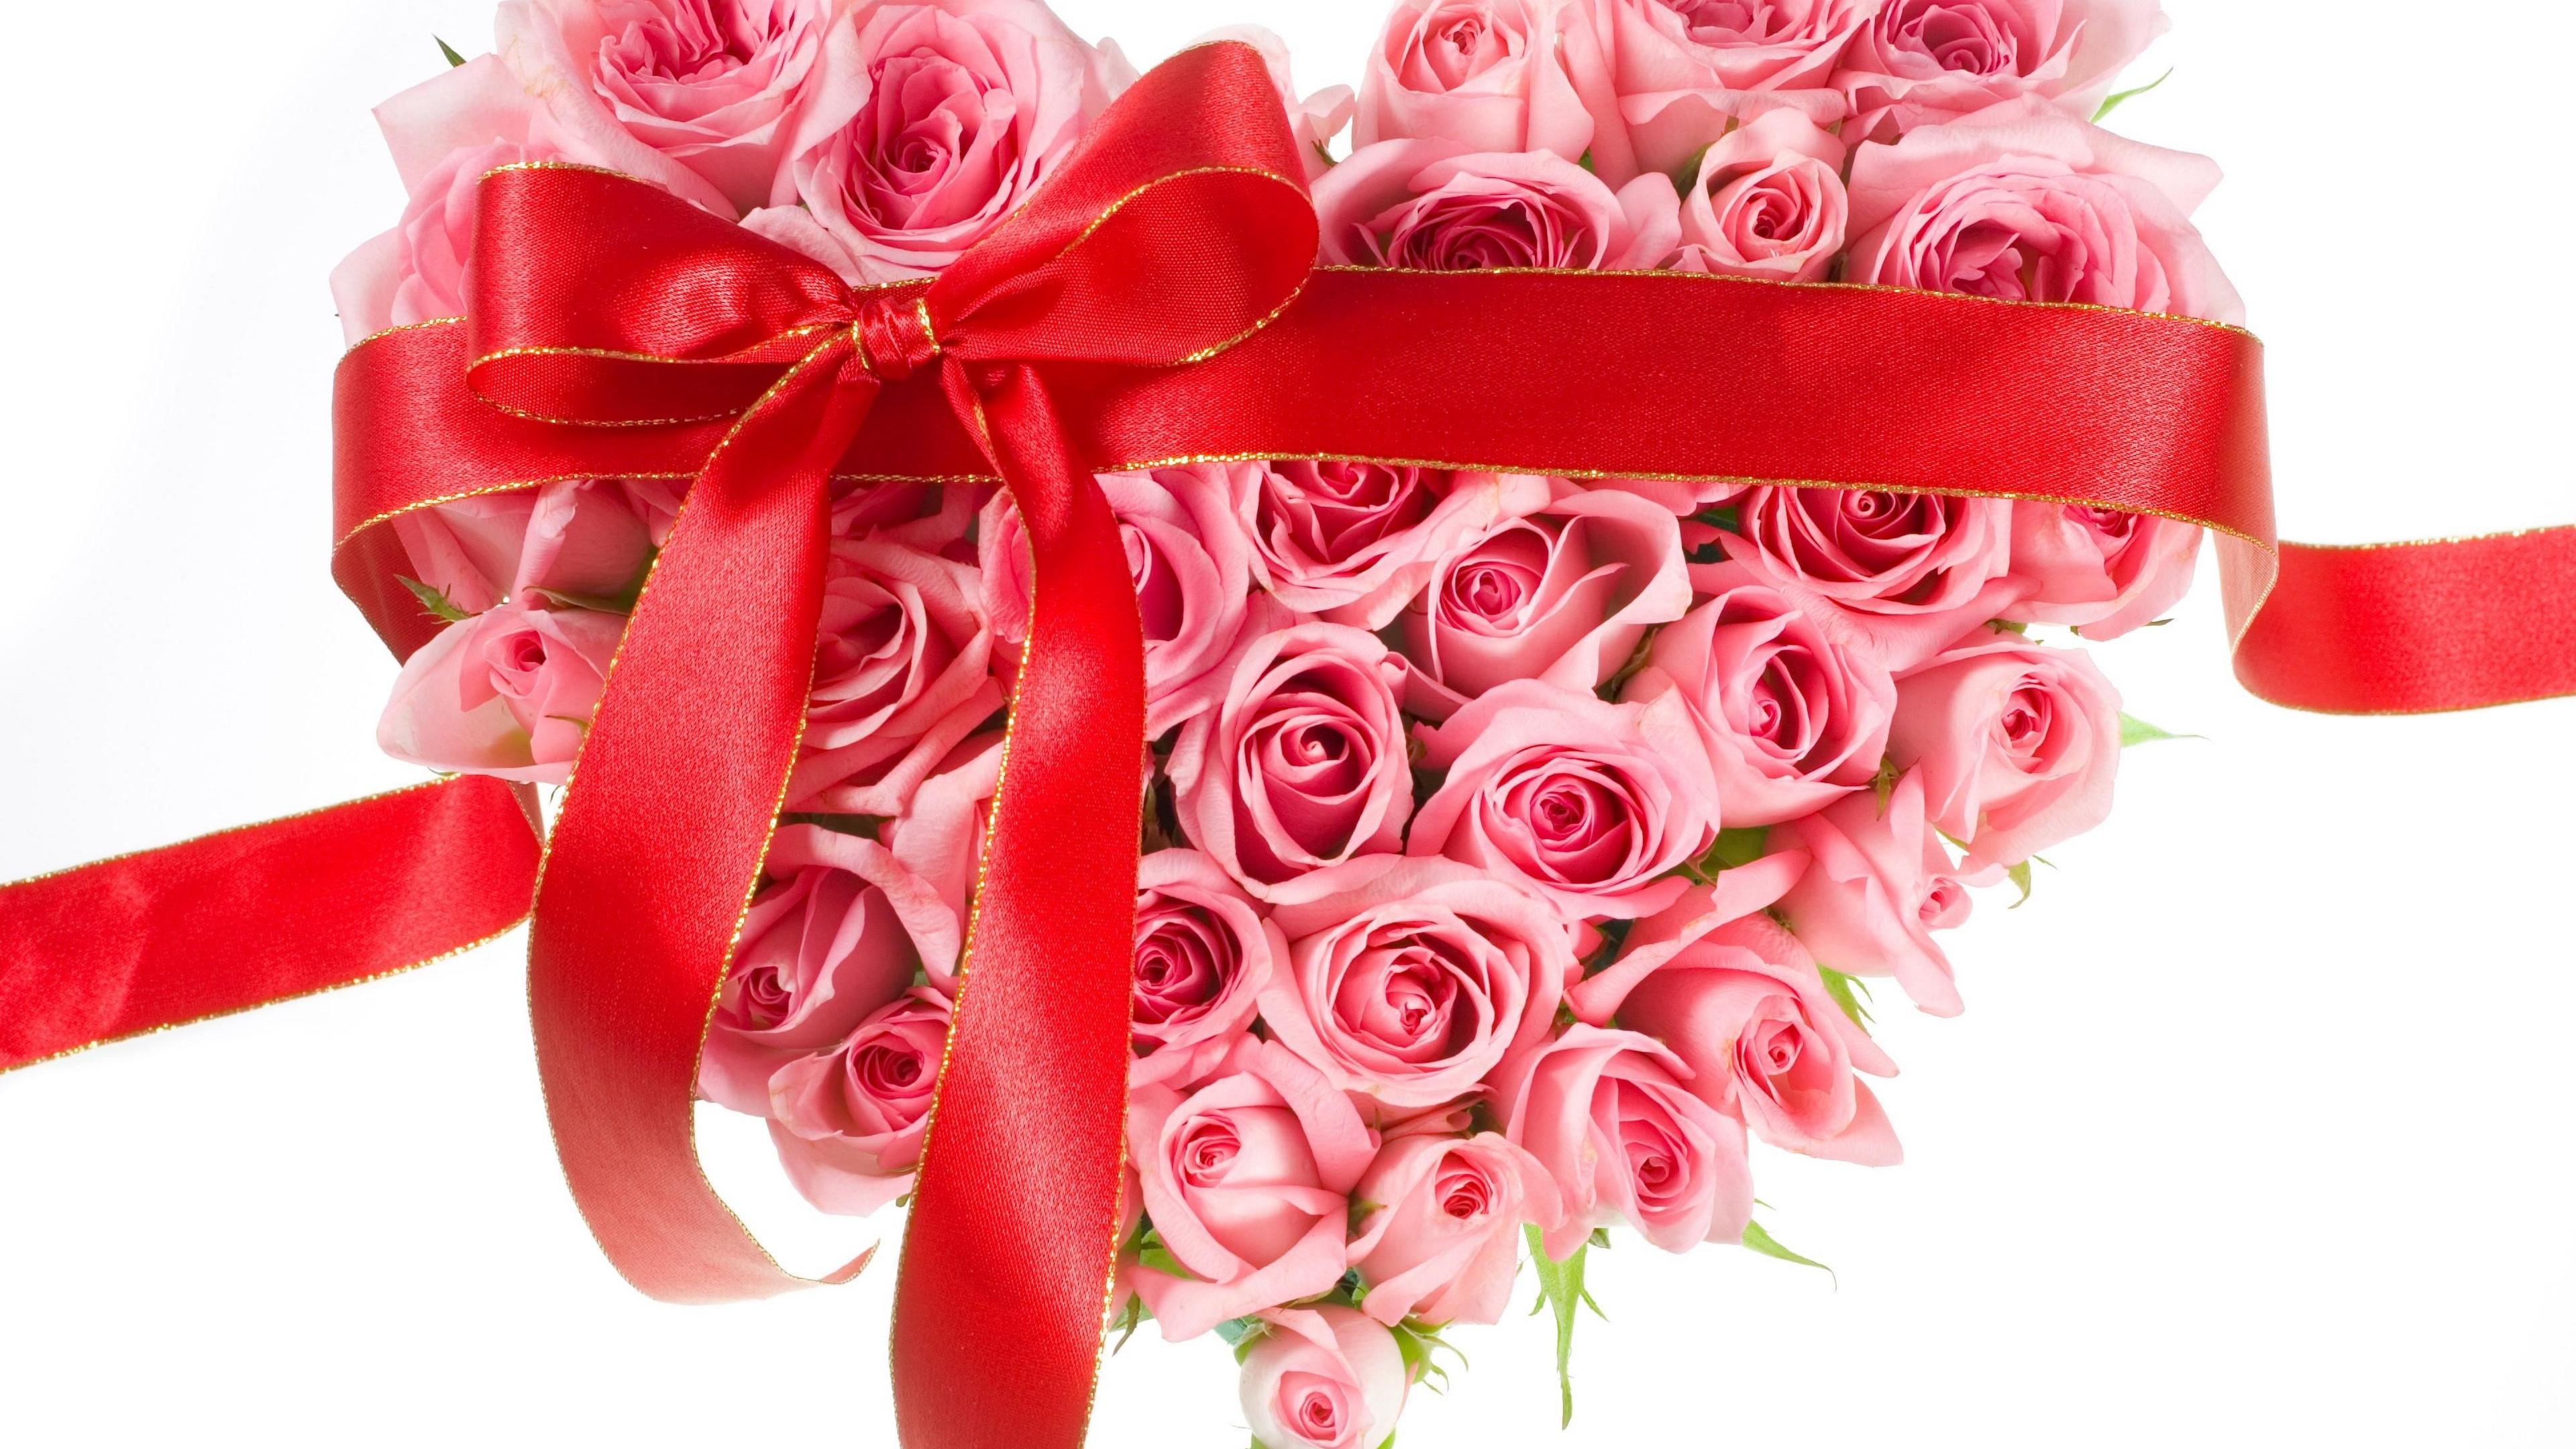 roses flowers hearts ribbons bows 4k 1540064887 - roses, flowers, hearts, ribbons, bows 4k - Roses, Hearts, Flowers